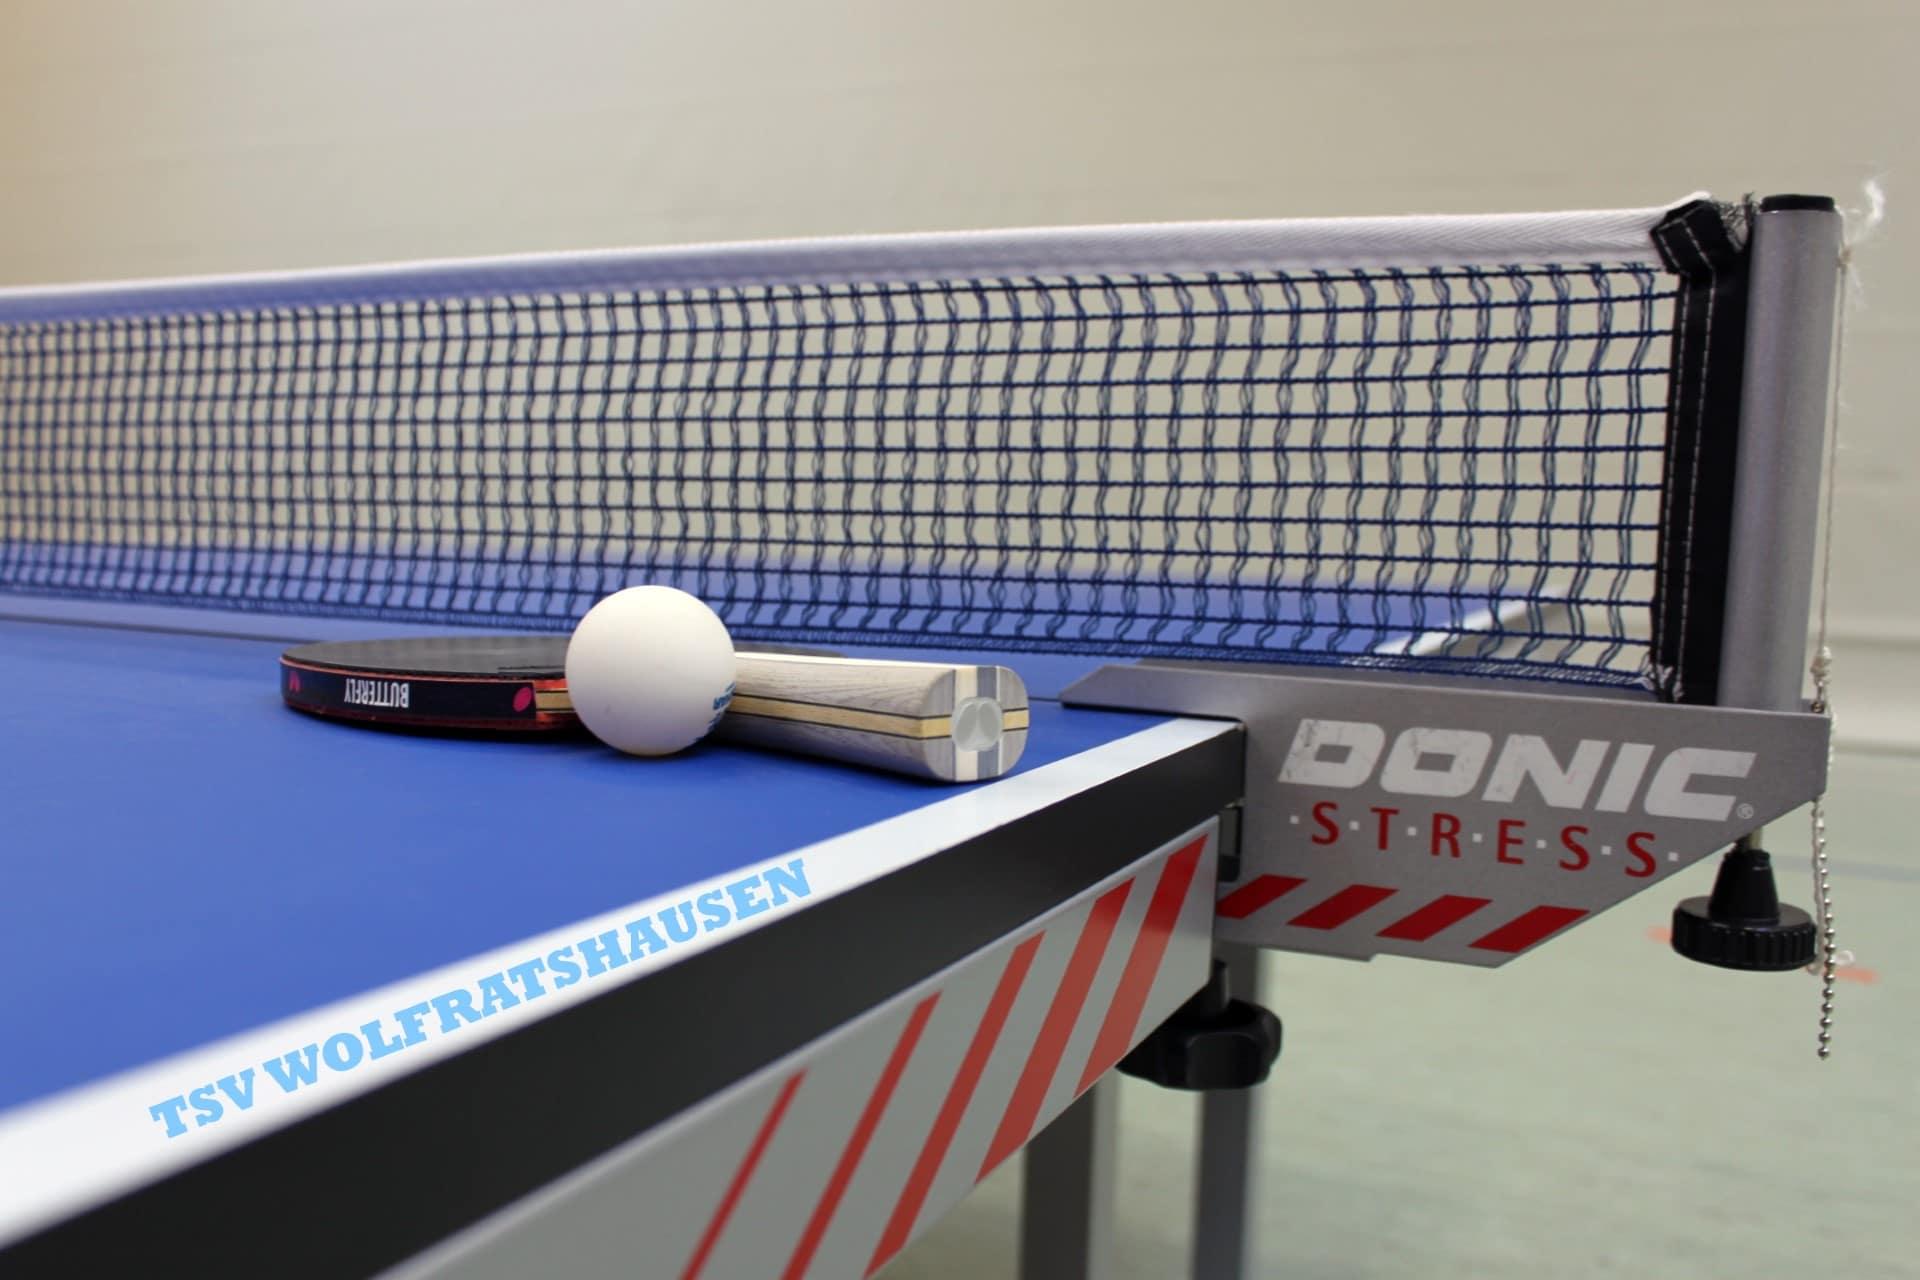 Jugend spielt Unentschieden gegen Bad Tölz